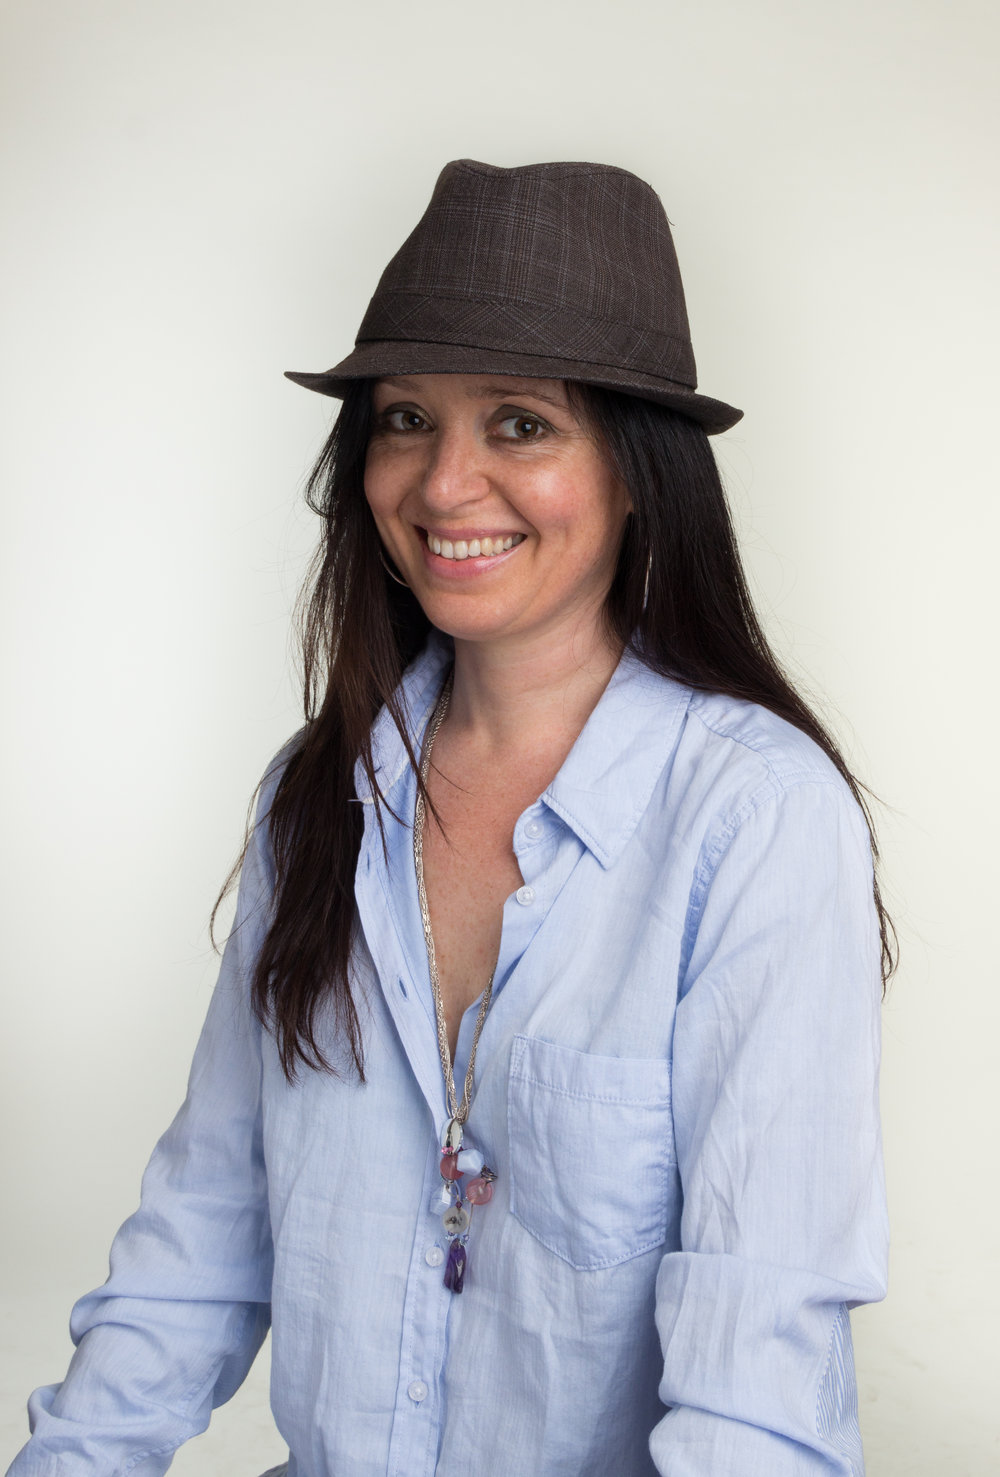 Jane Cormack, janecormack.com